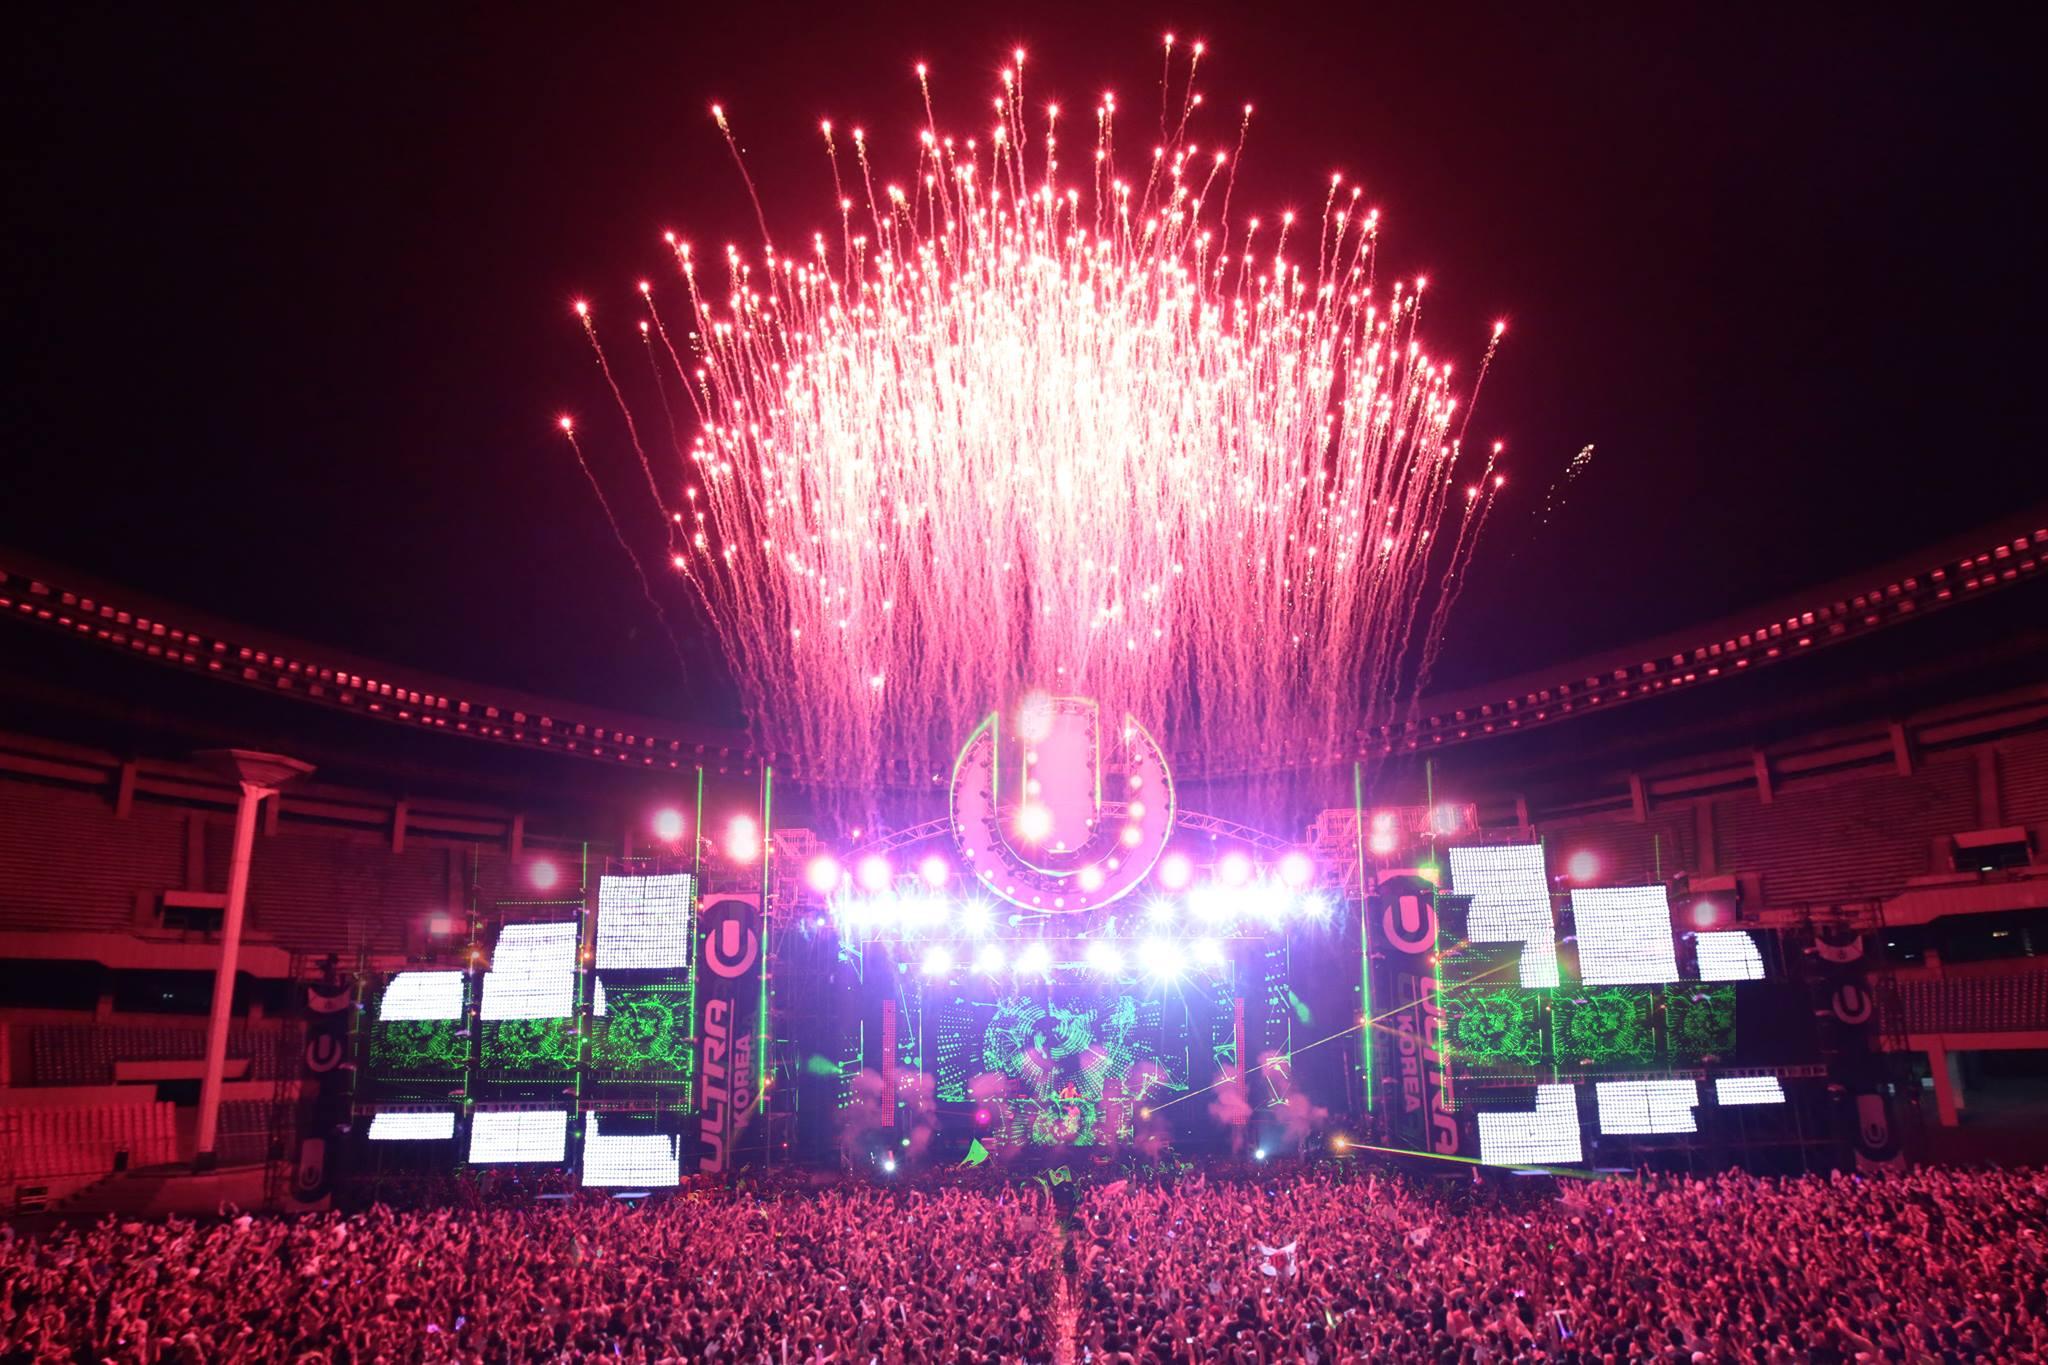 [Breaking News] Ultra Korea Postponed Until Fall 2020